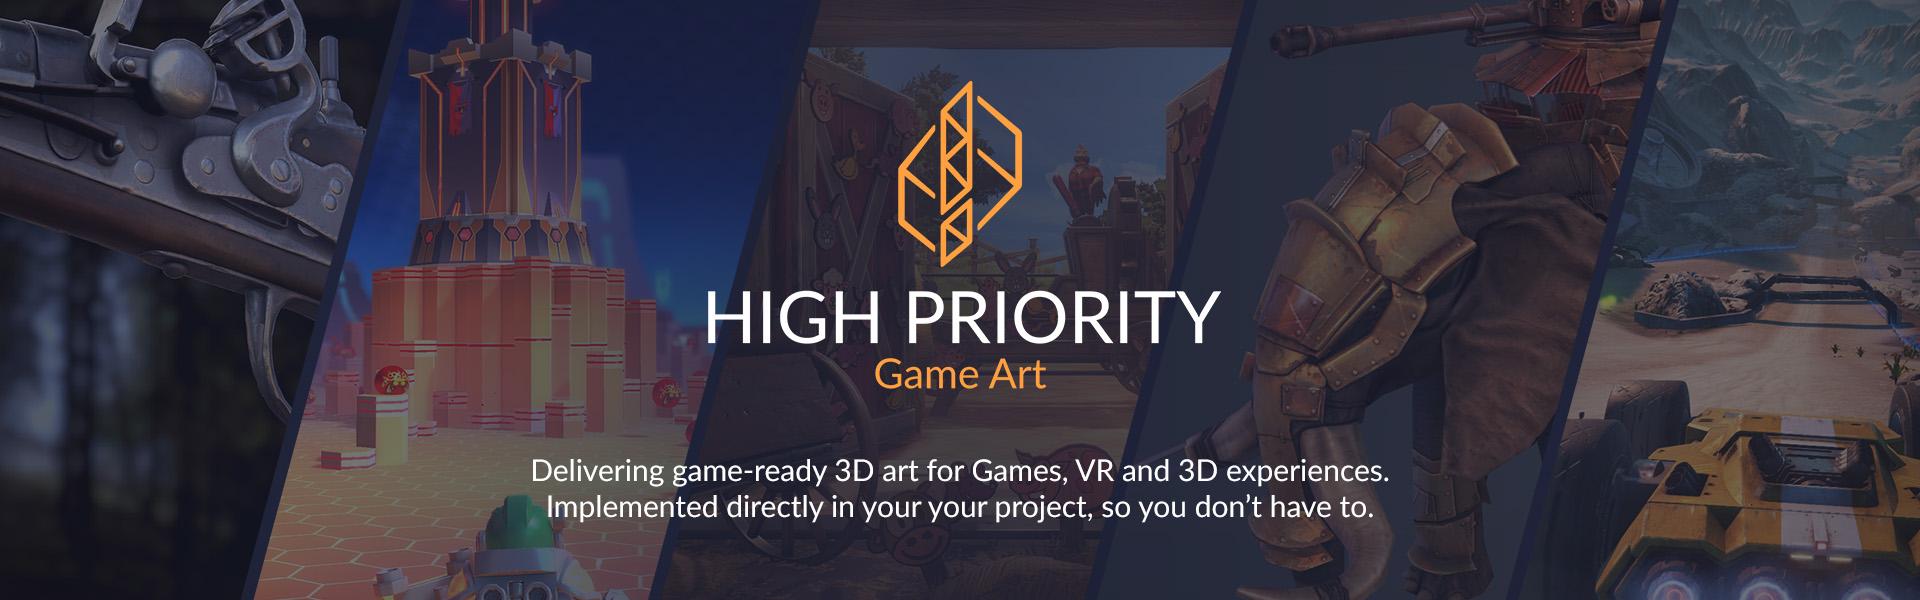 High Priority - Game Art - Top Banner 2